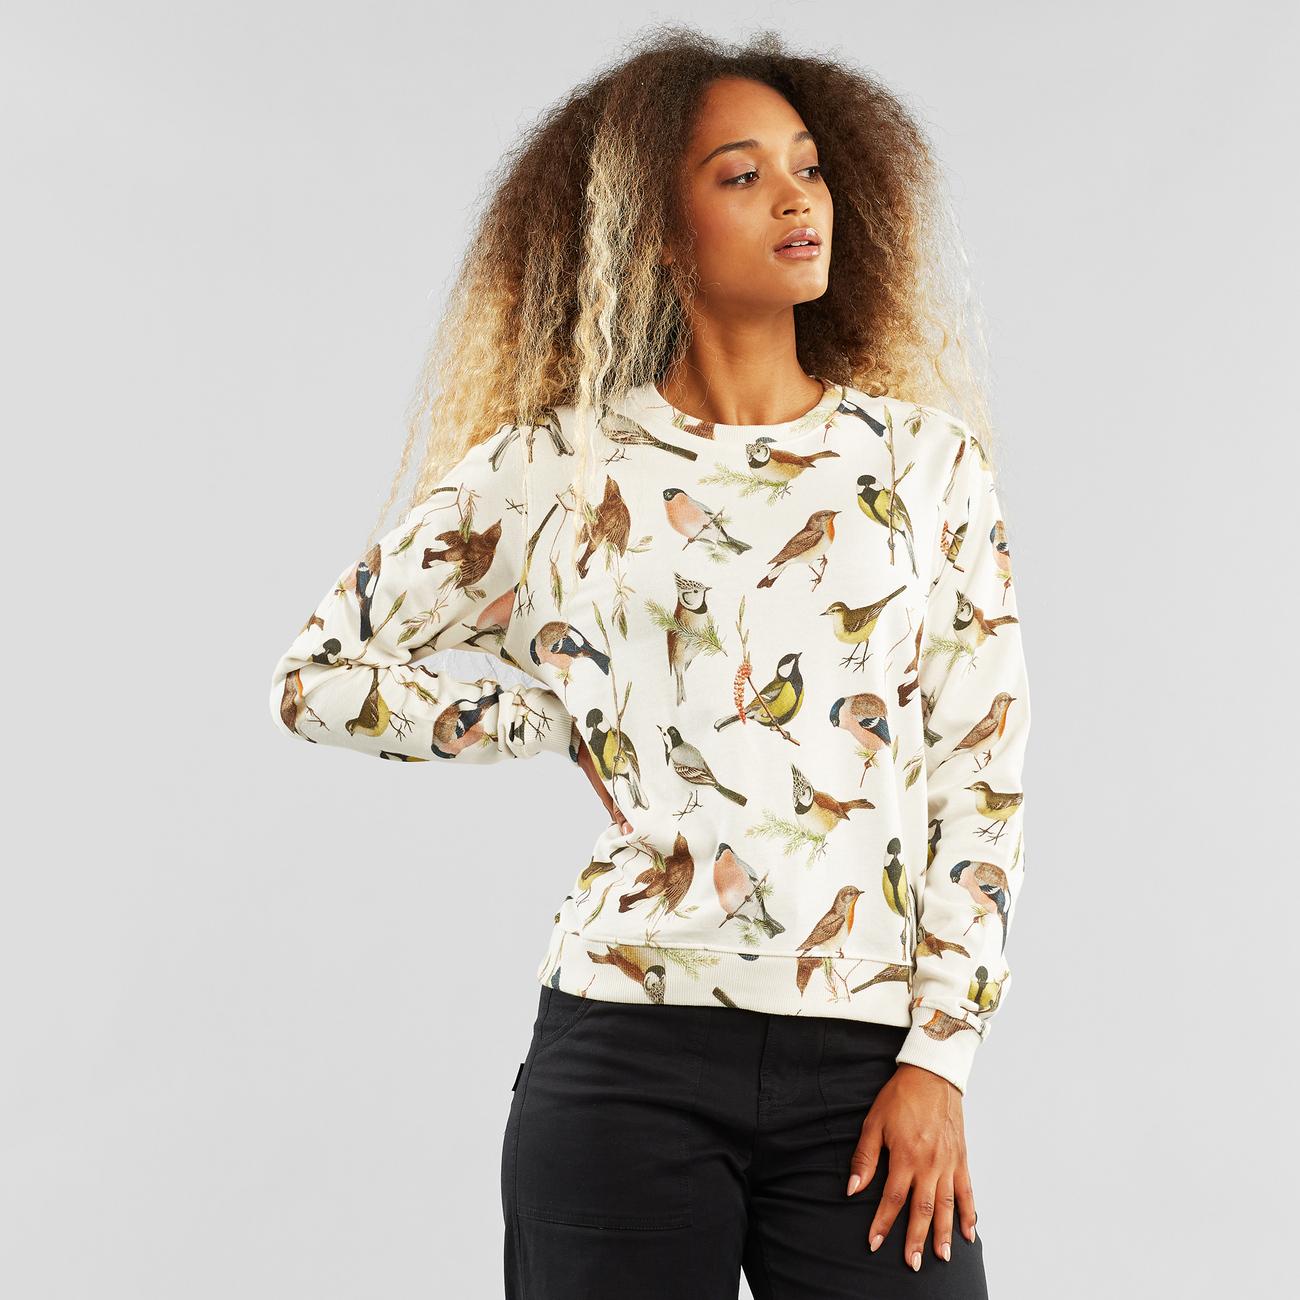 Sweatshirt Ystad Autumn Birds Off White